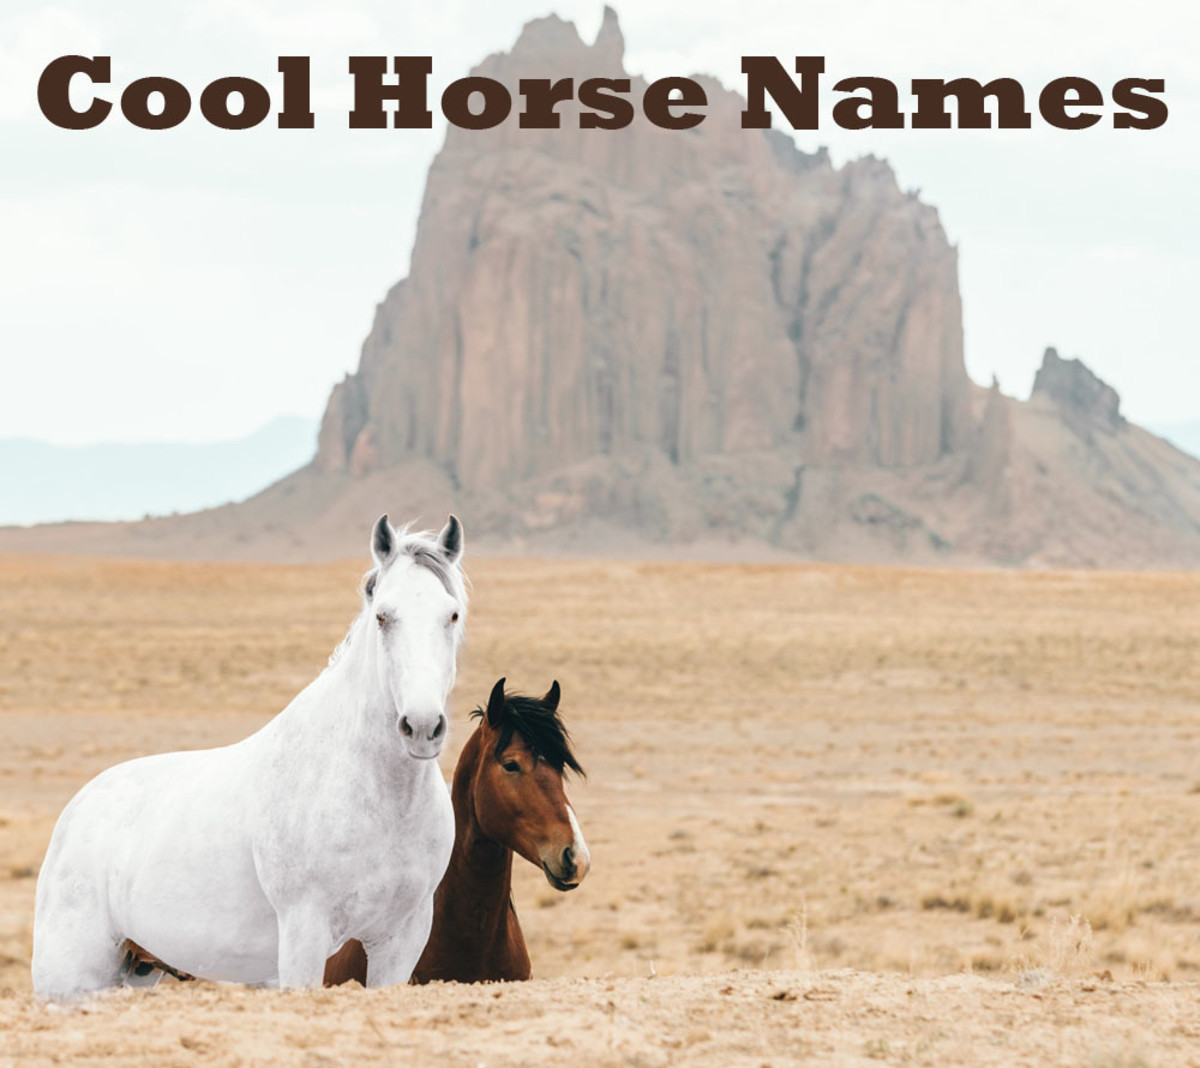 Wild horses in New Mexico.